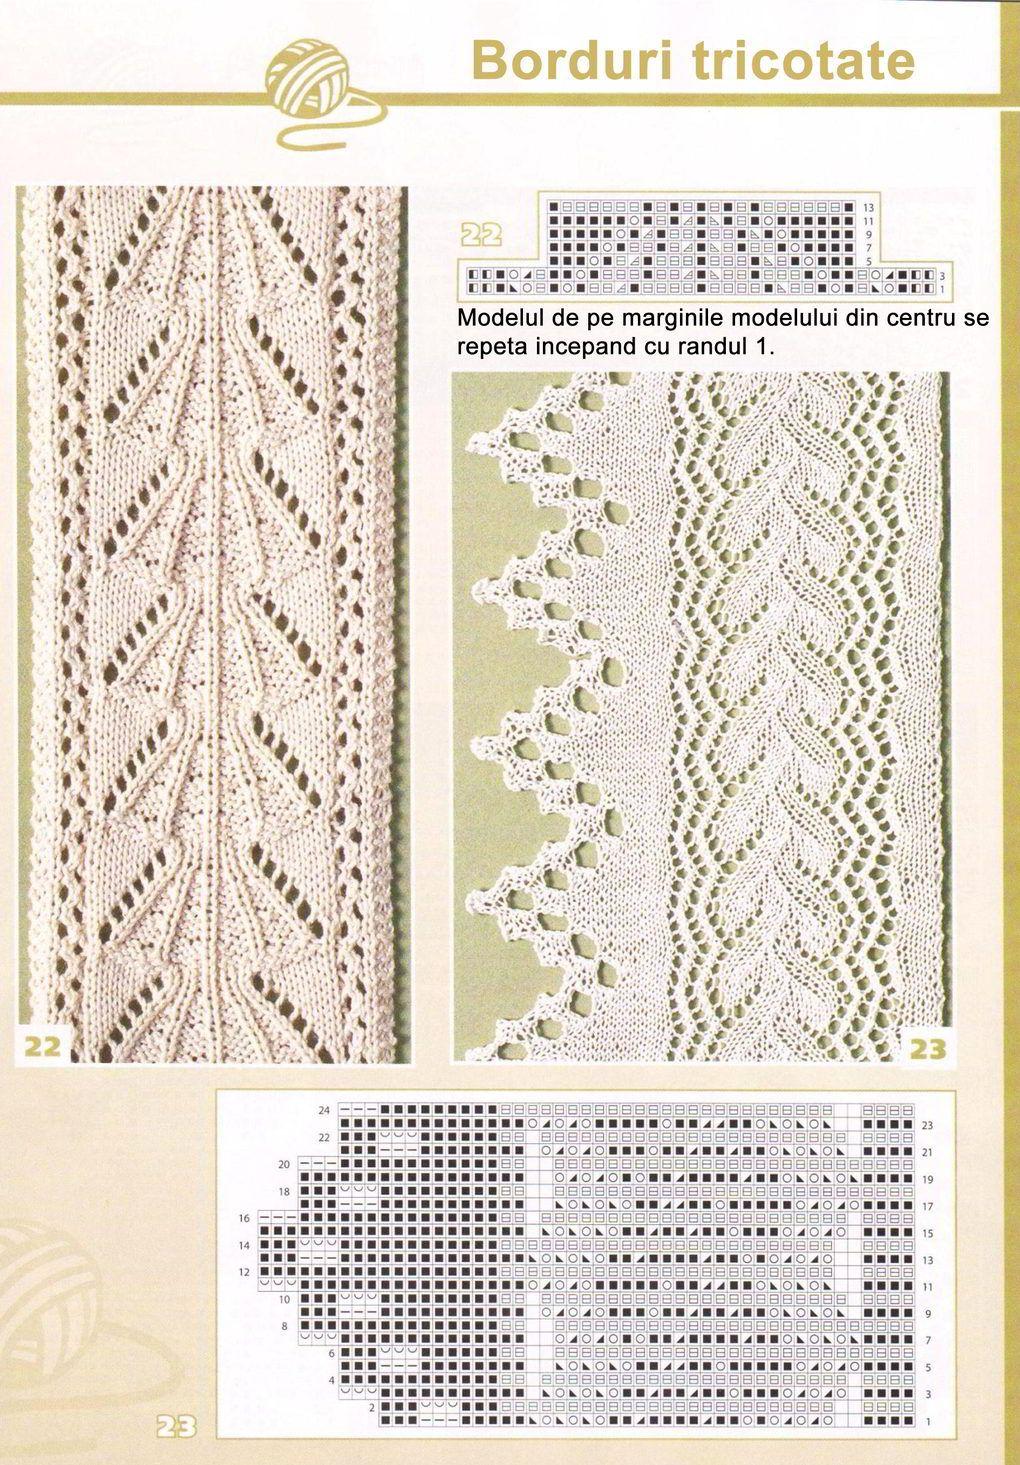 47 modèles de tricot   Pinterest   Patrón gratis, Patrones y Puntos